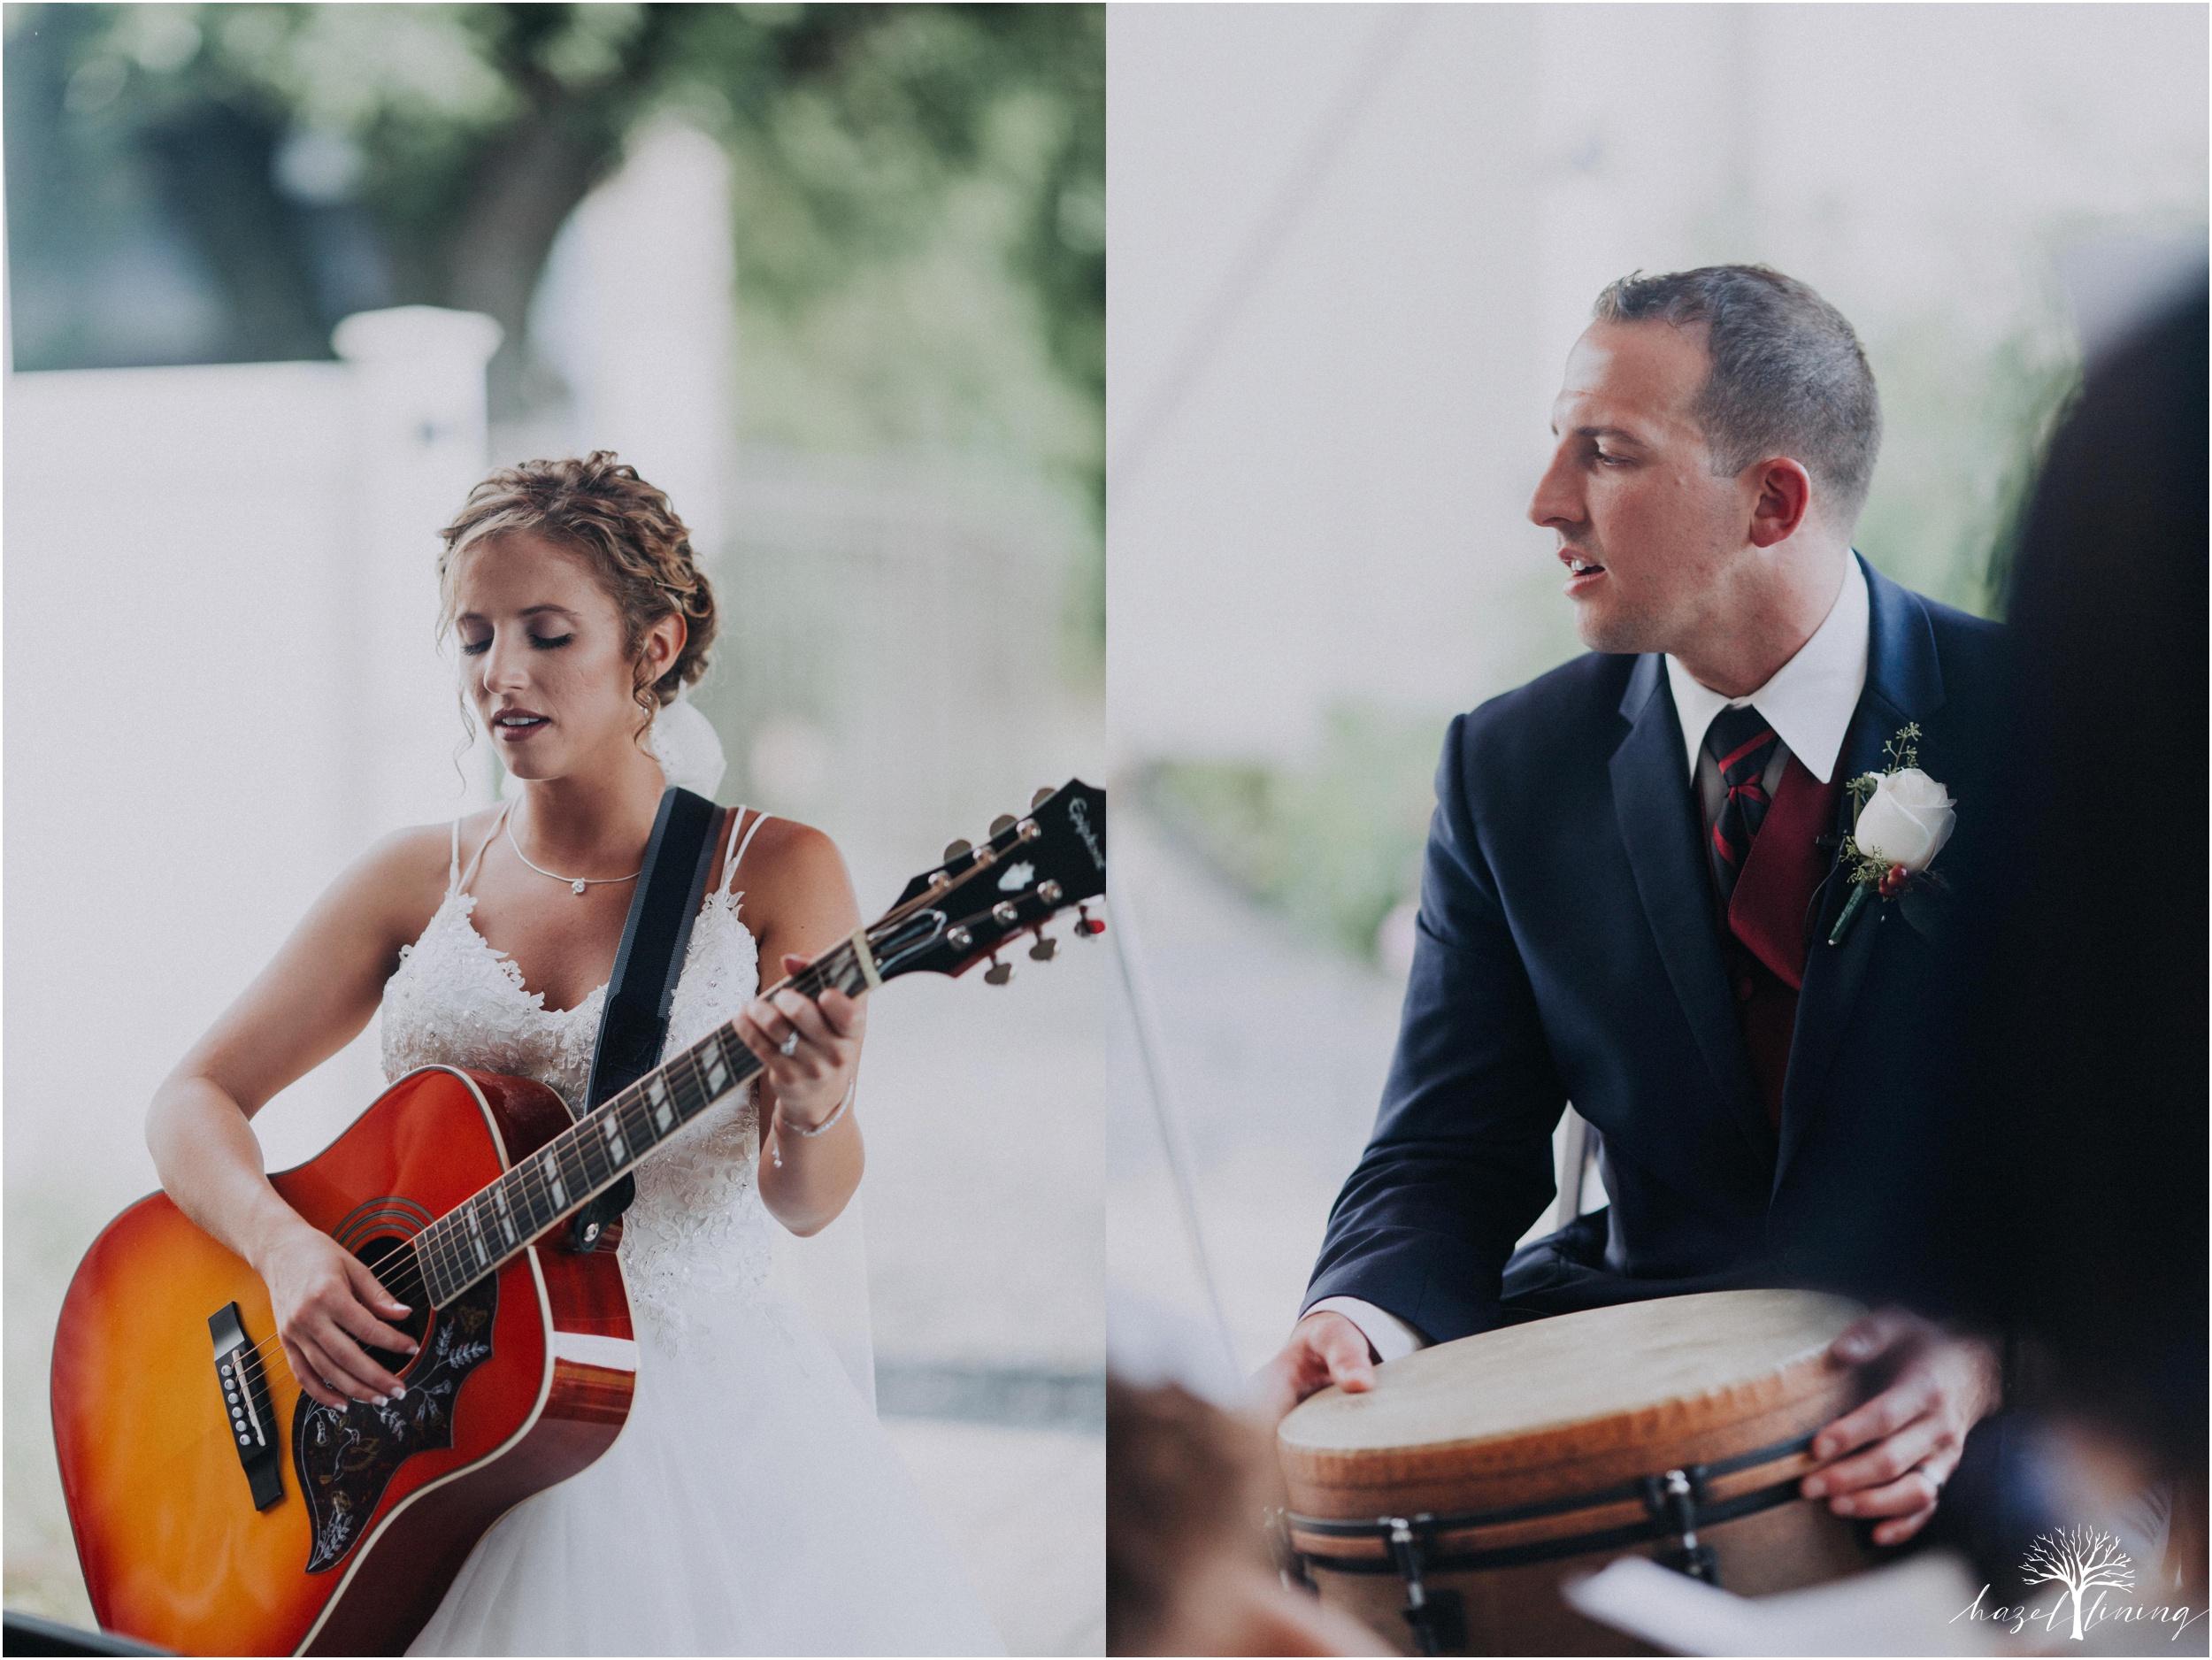 jonathan-weibel-becky-haywood-loft-at-sweetwater-cc-pennsburg-pennsylvania-rainy-day-summer-wedding-hazel-lining-travel-wedding-elopement-photography_0054.jpg